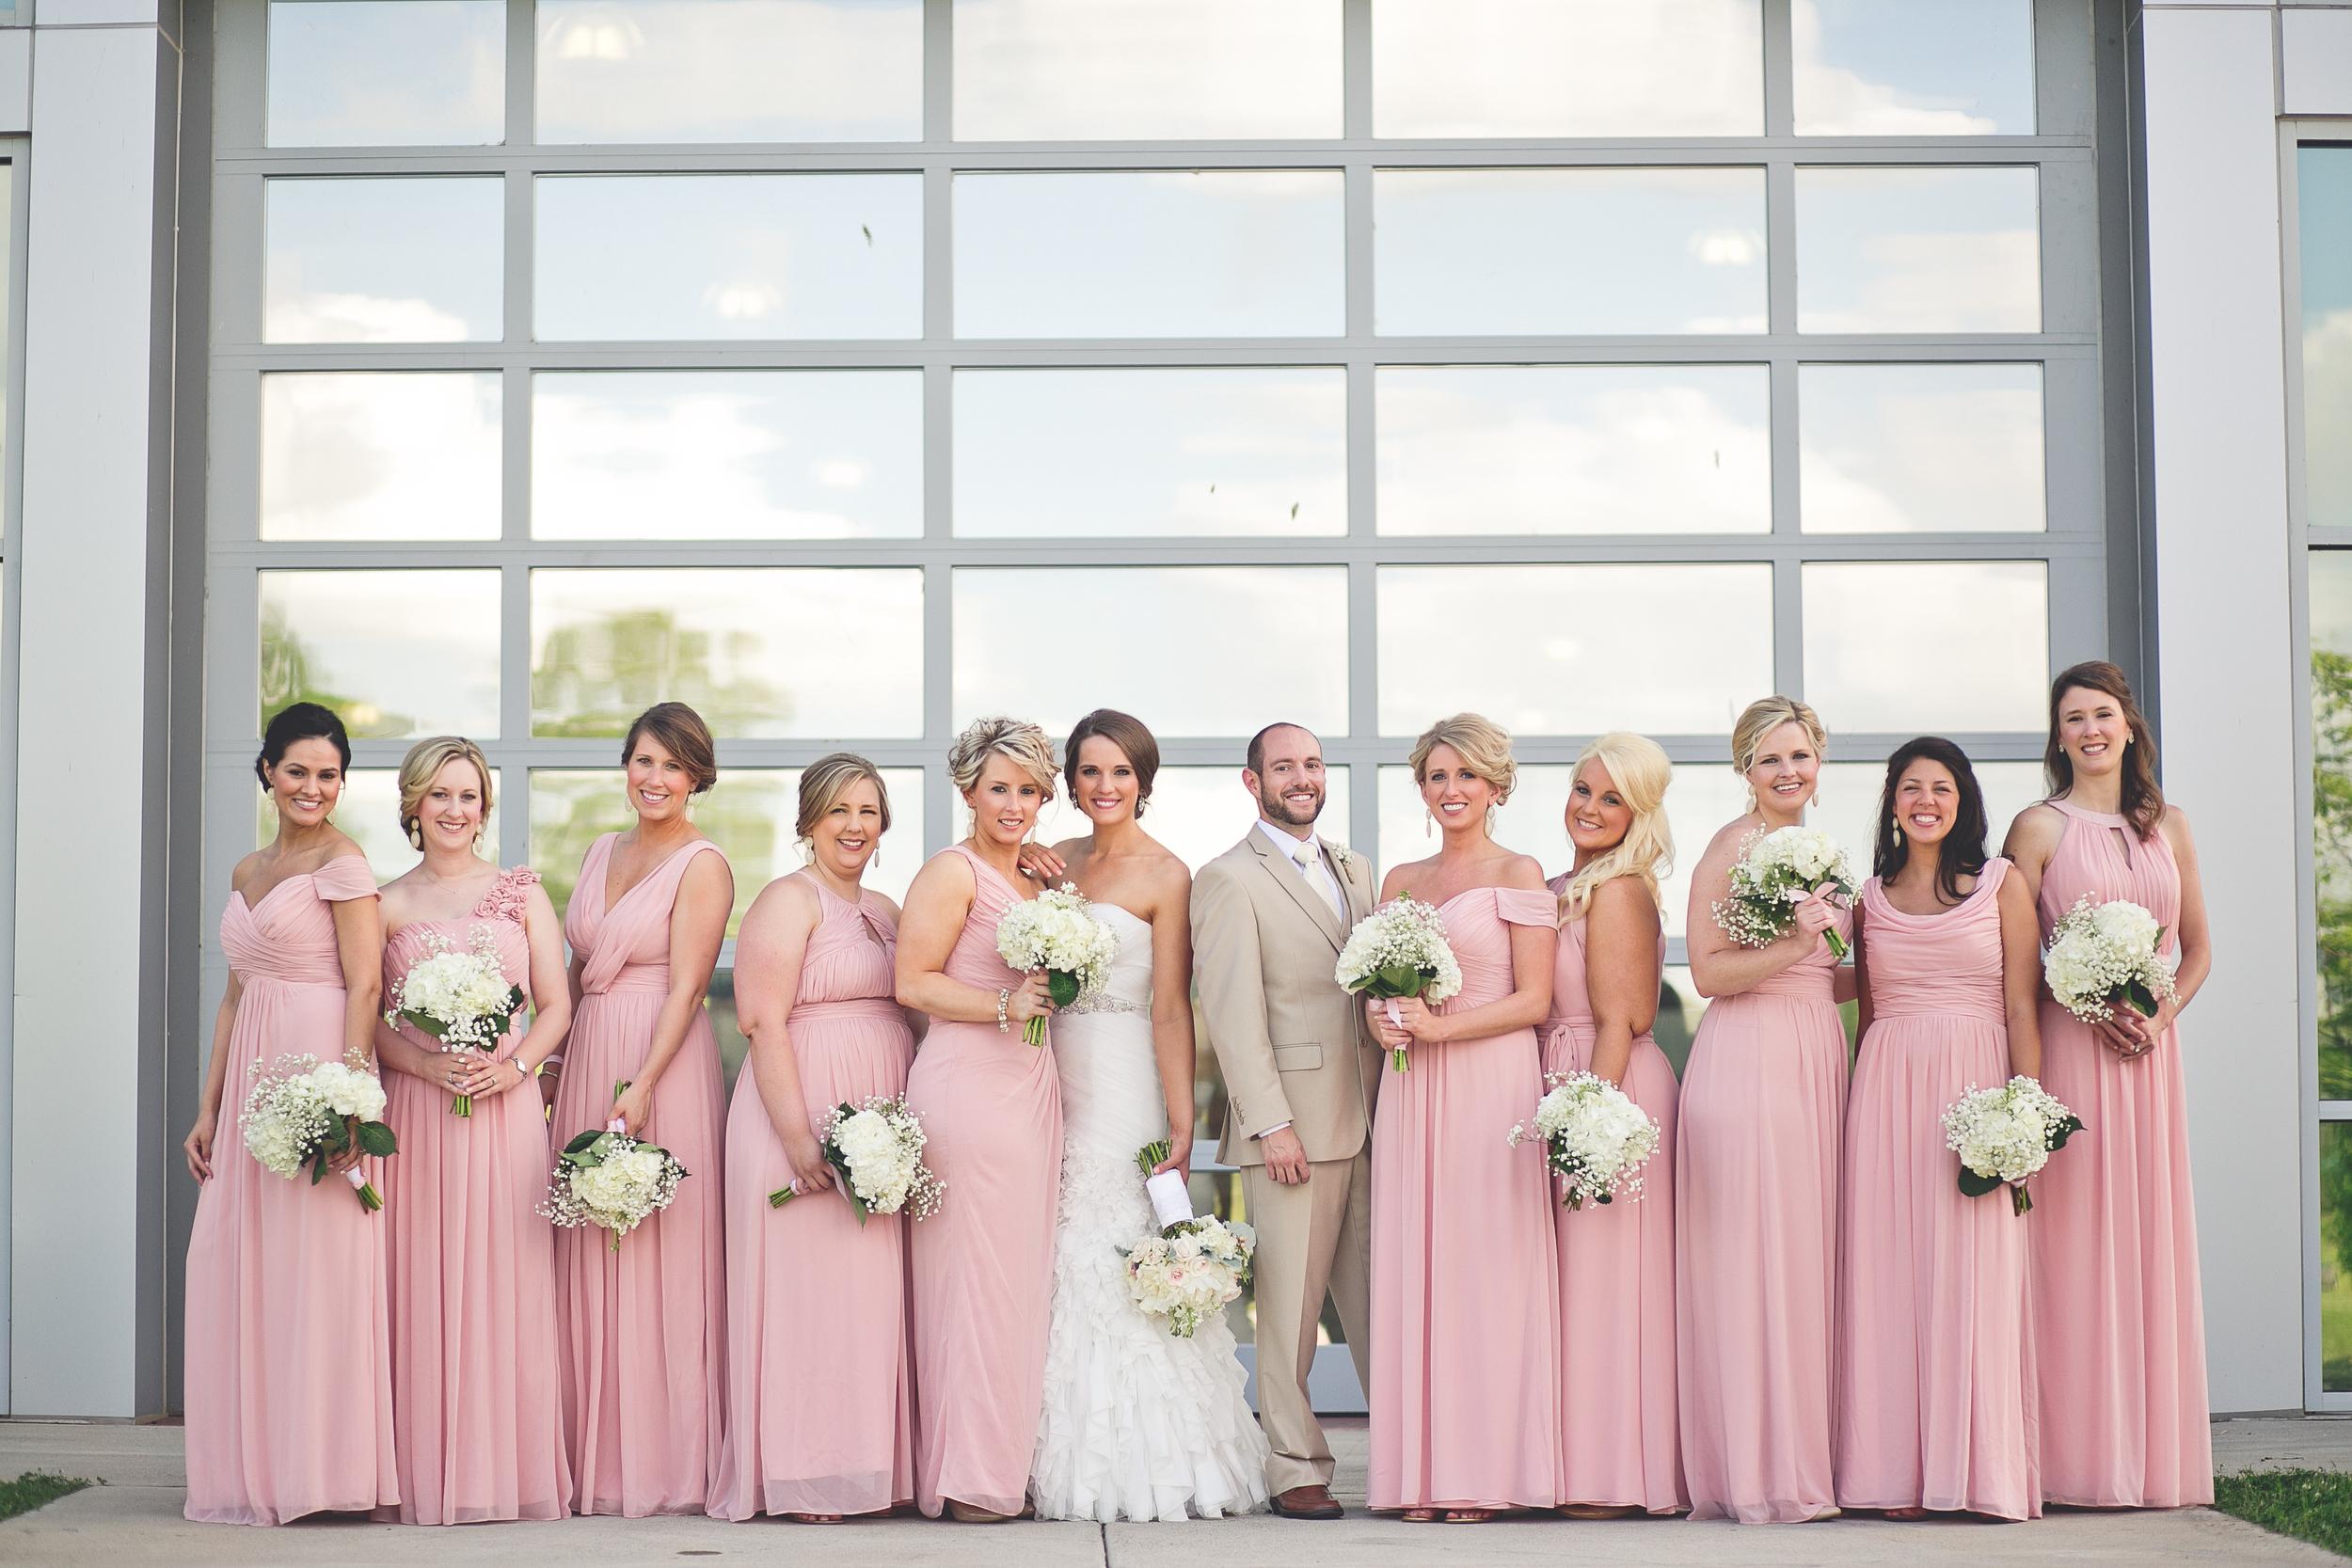 byshea-crass-weddingparty-055.jpg